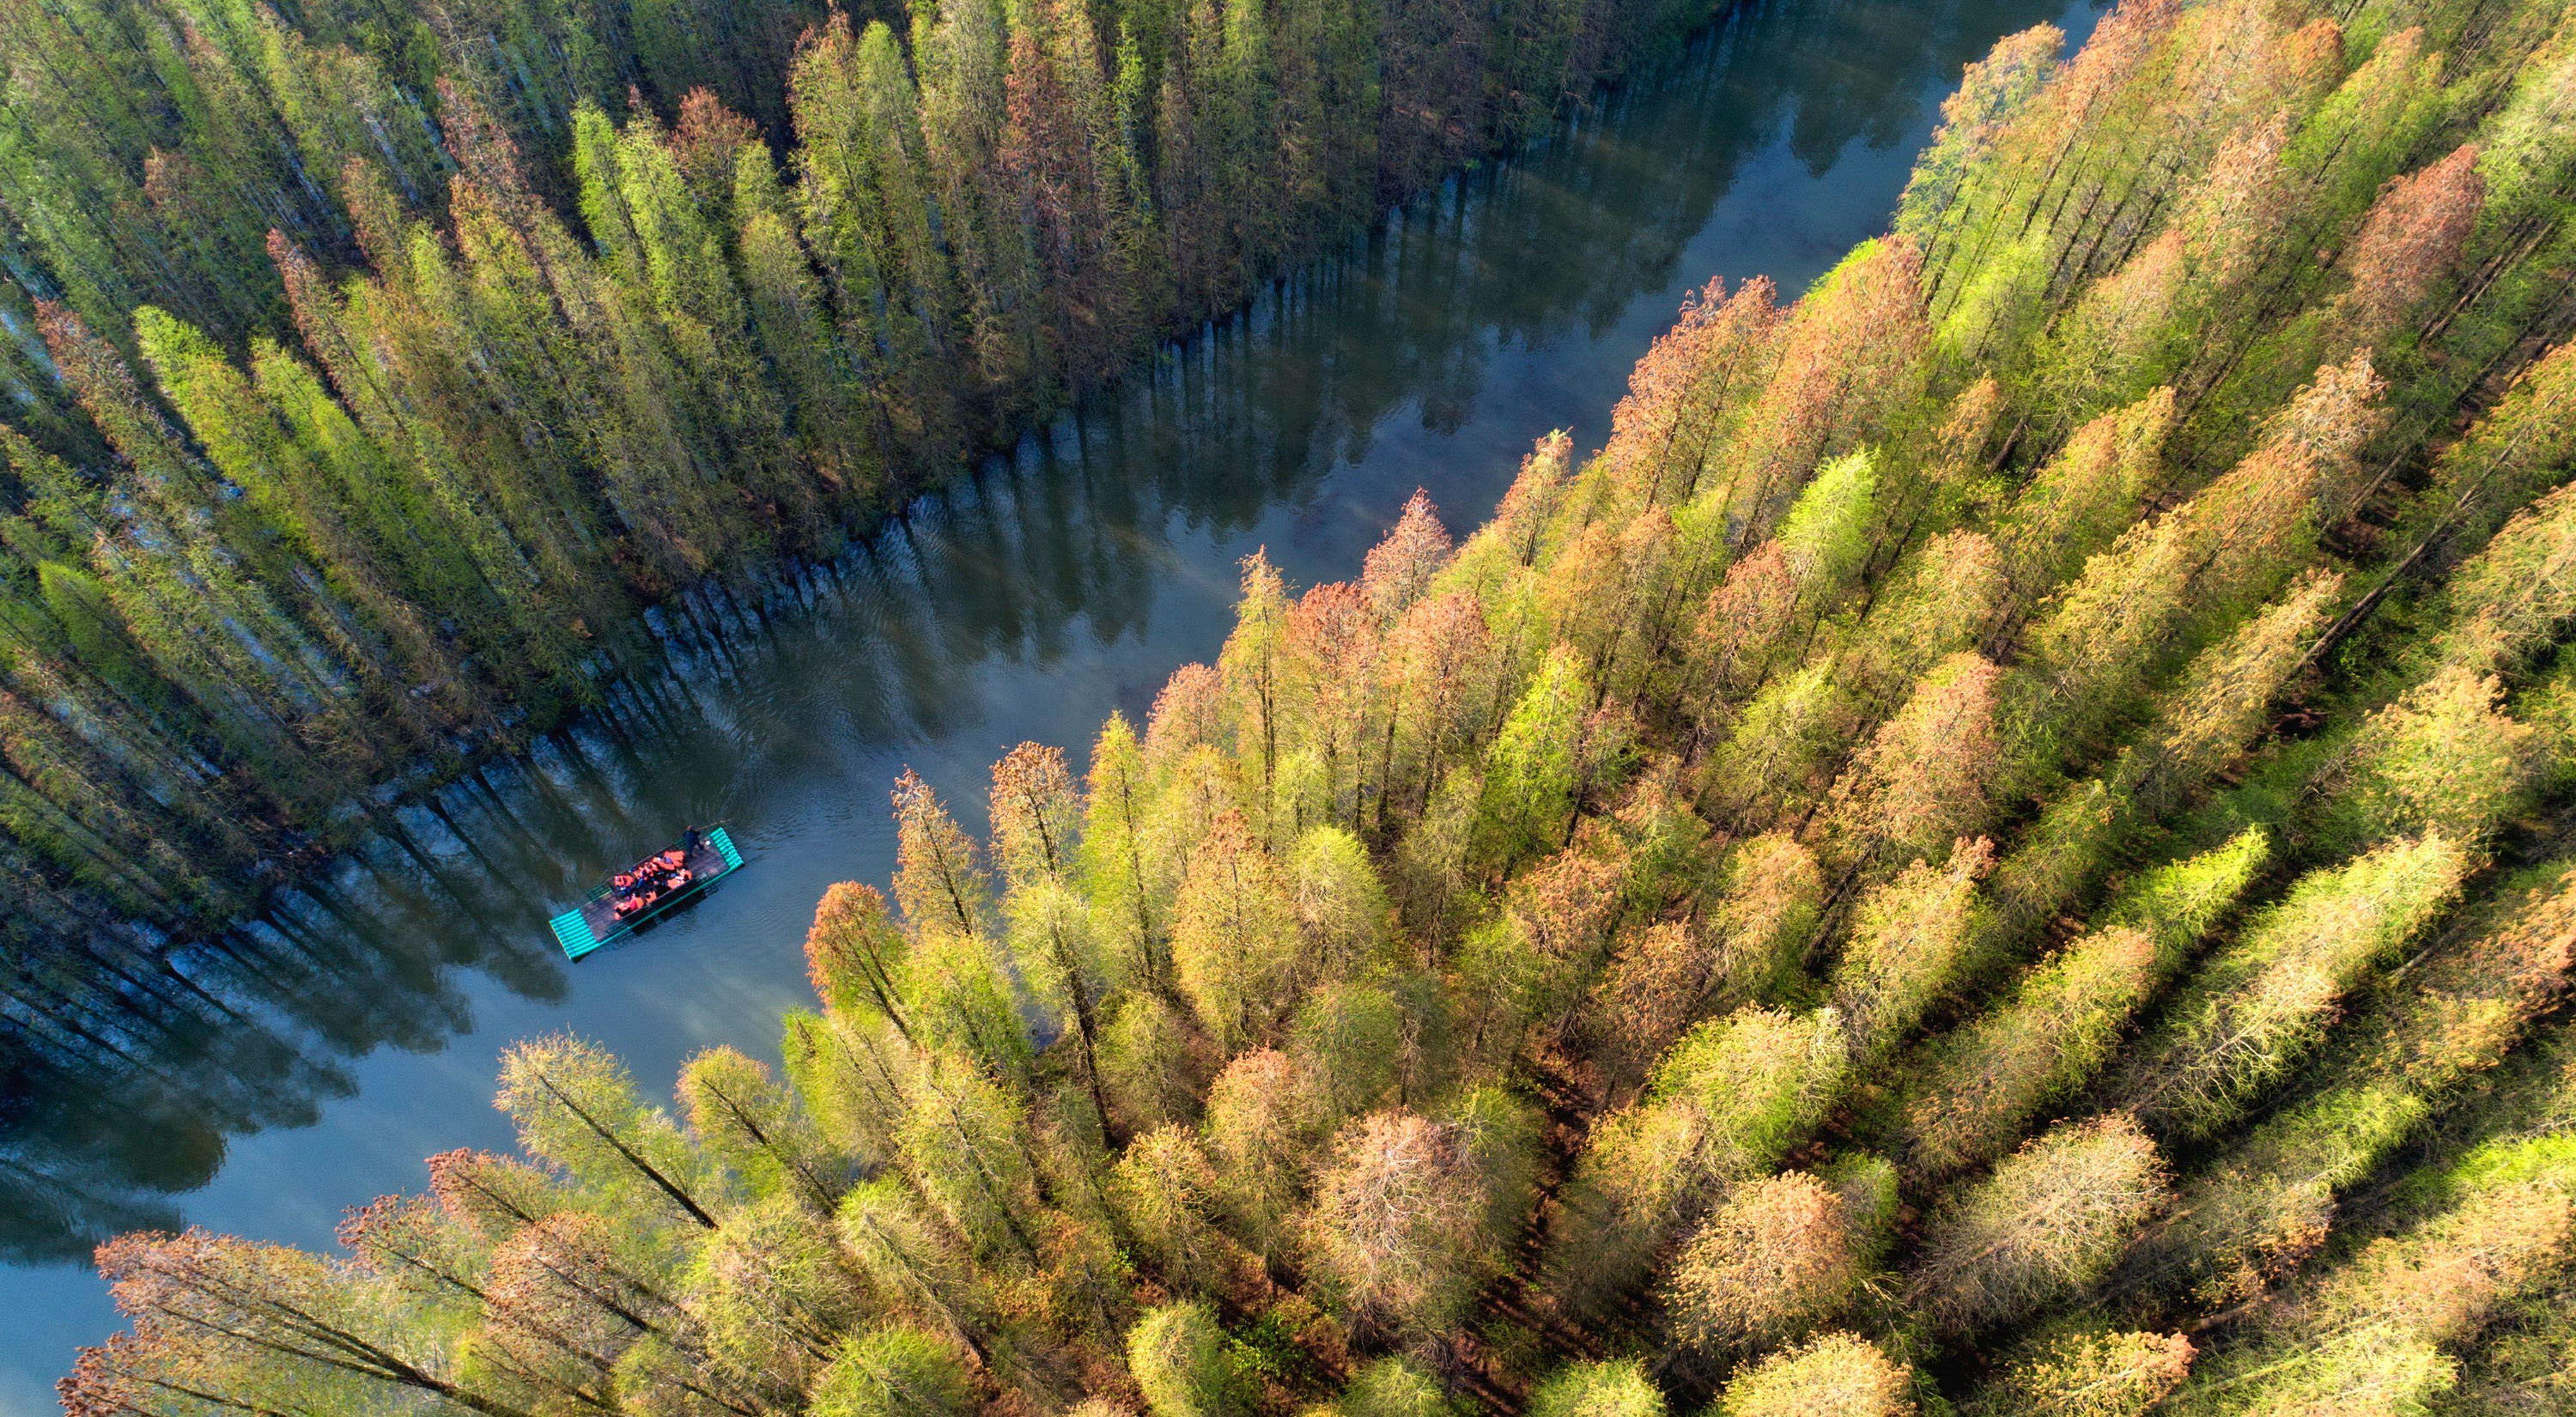 Tourists drift on a bamboo raft in jinhu county, huai 'an city, east China's jiangsu province, April 13, 2019.